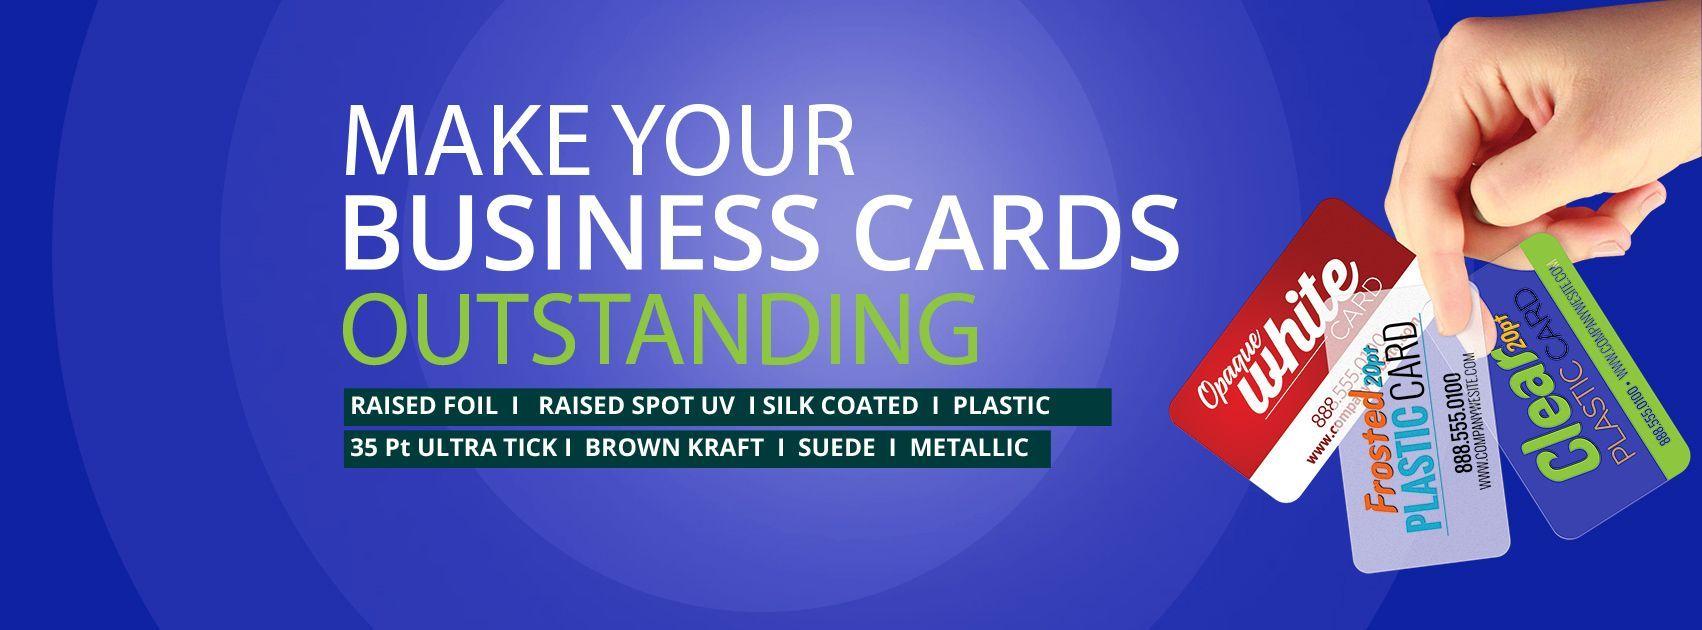 Business Card Printing Calgary Printing Business Cards Business Card Stand Printed Cards